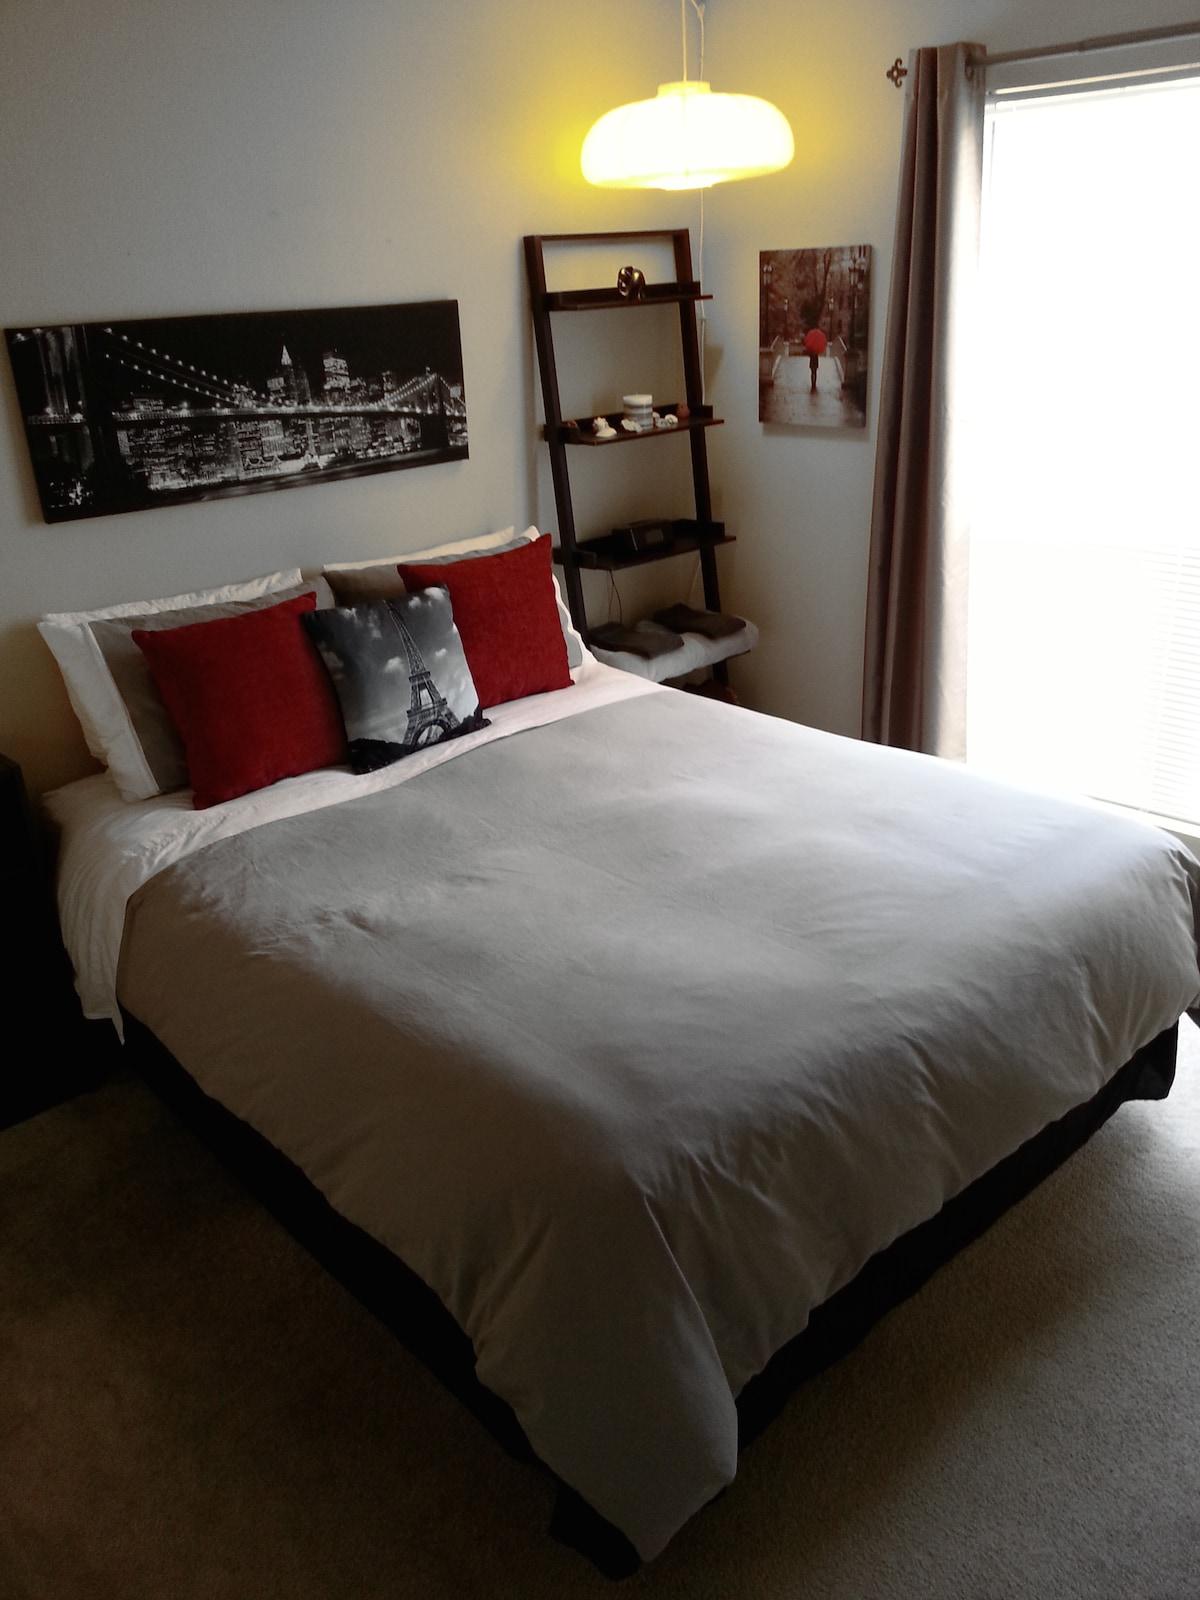 soft, comfortable sheets/duvet